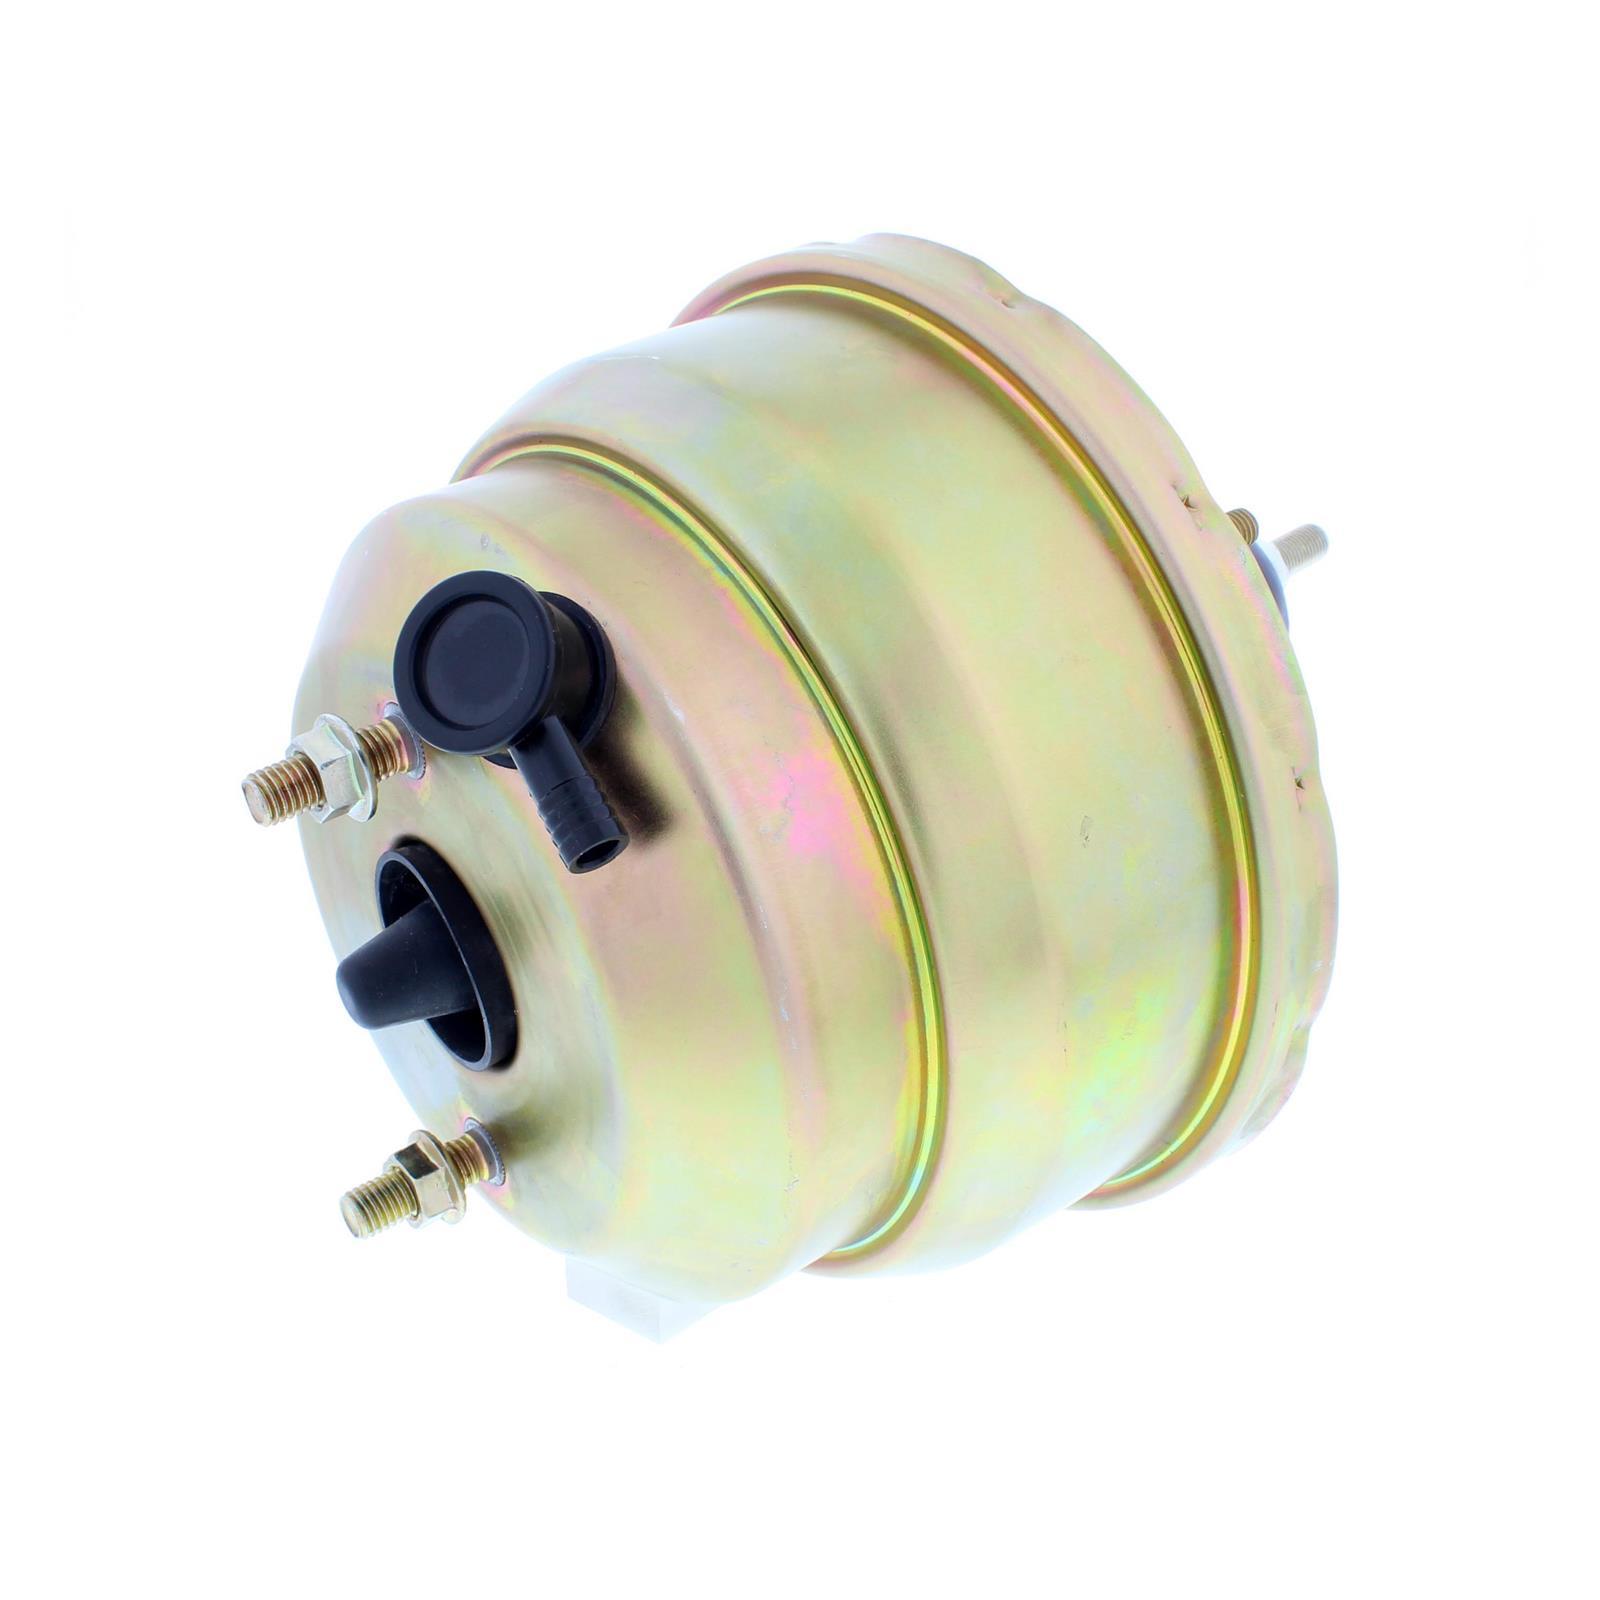 Speedway Dual Diaphragm Power Brake Booster 8 Inch Chromate Finish Gmc Headlamp 5 Pole Relay Wiring Diagram